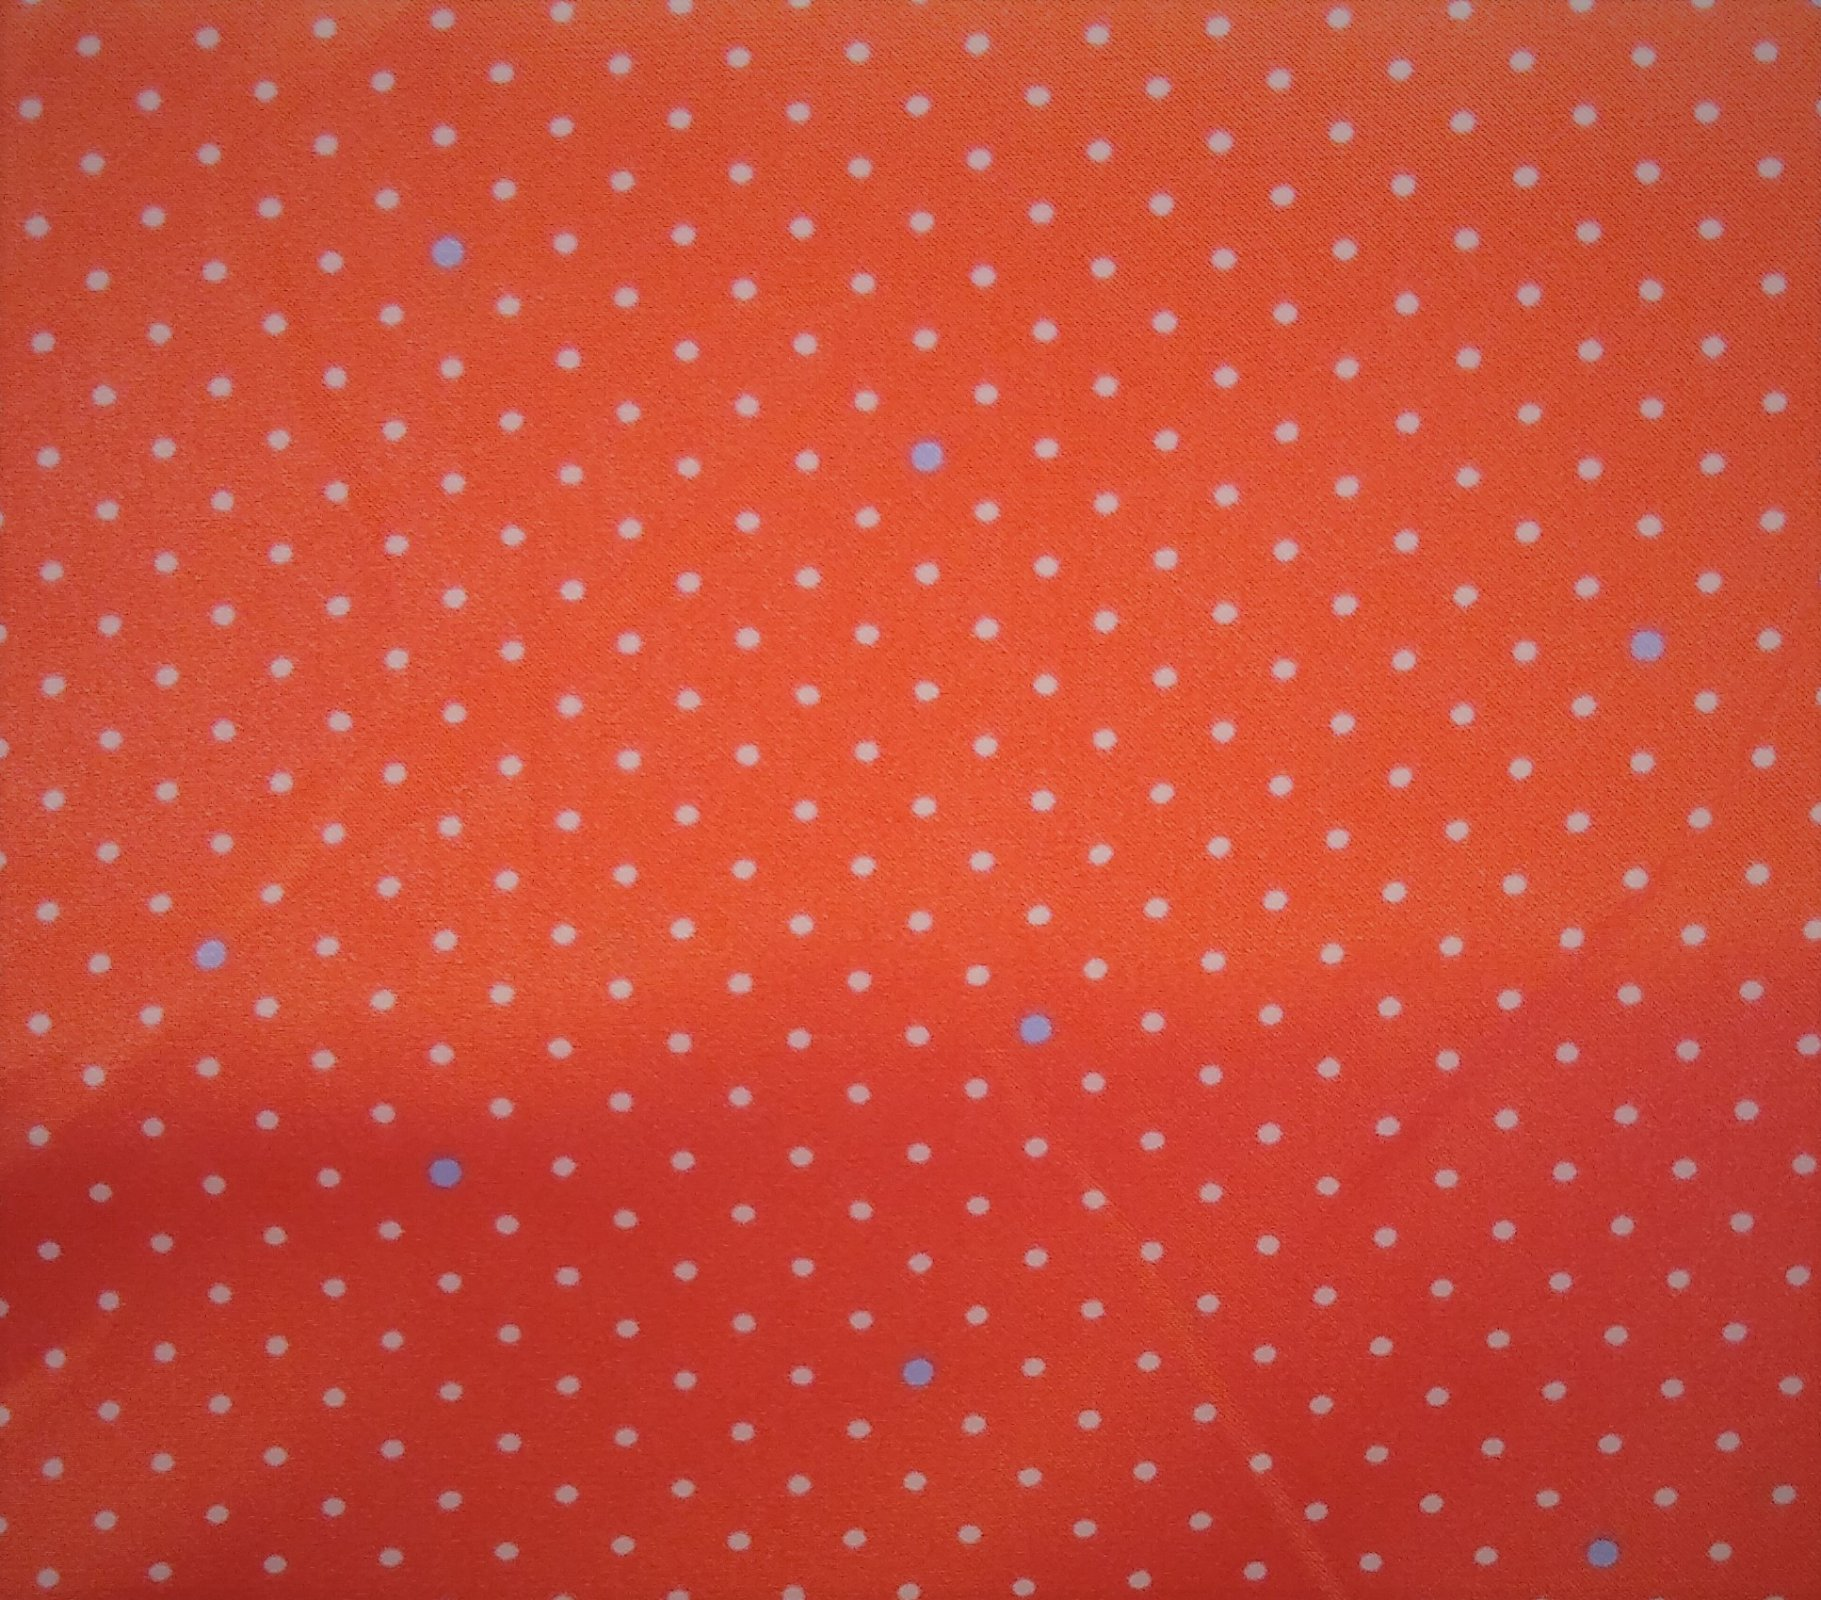 Pin Dot Poly Satin - Coral - Michael Miller